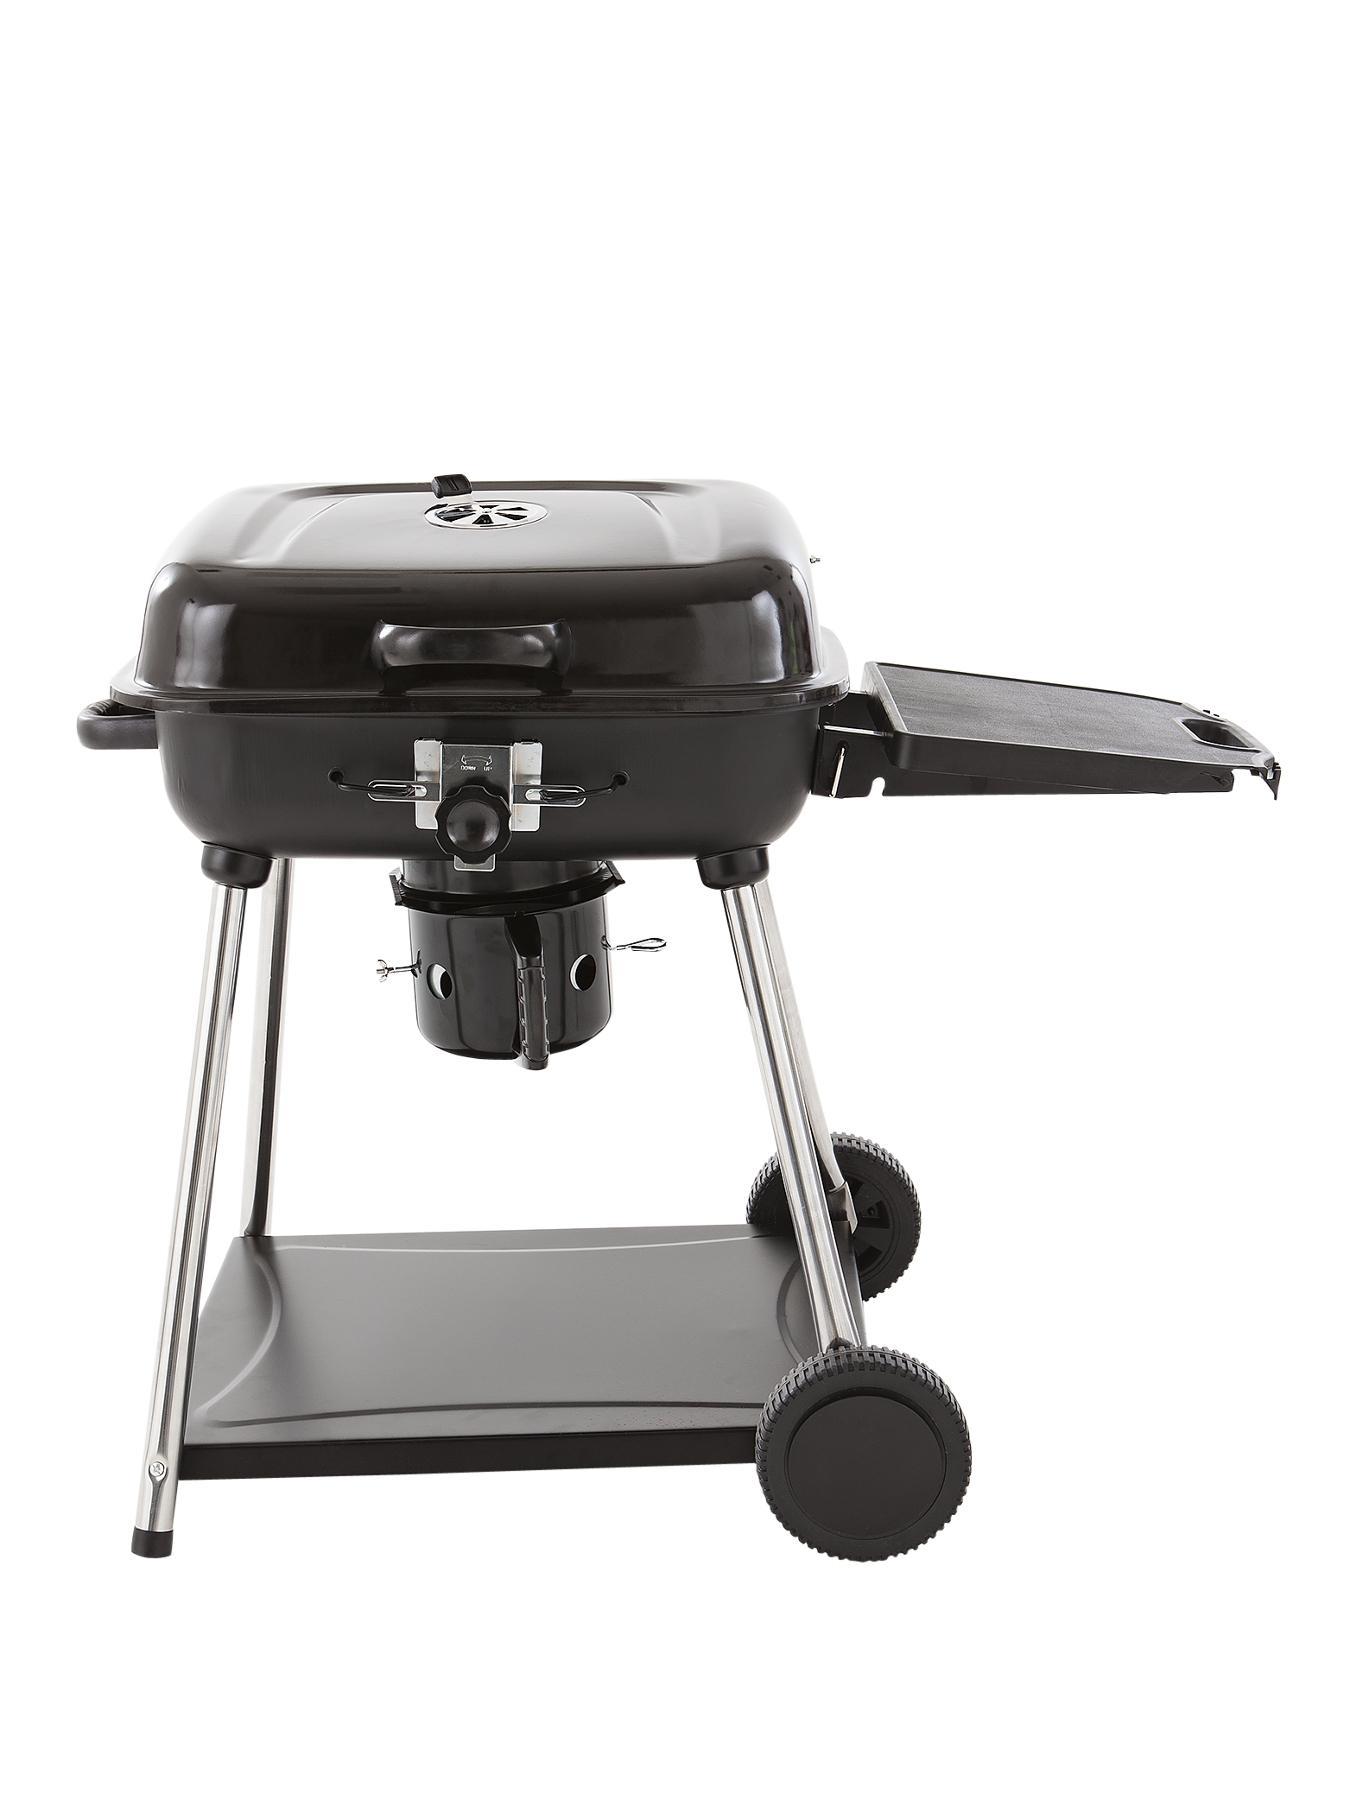 New Grand Charcoal BBQ Grill plus Warming Rack